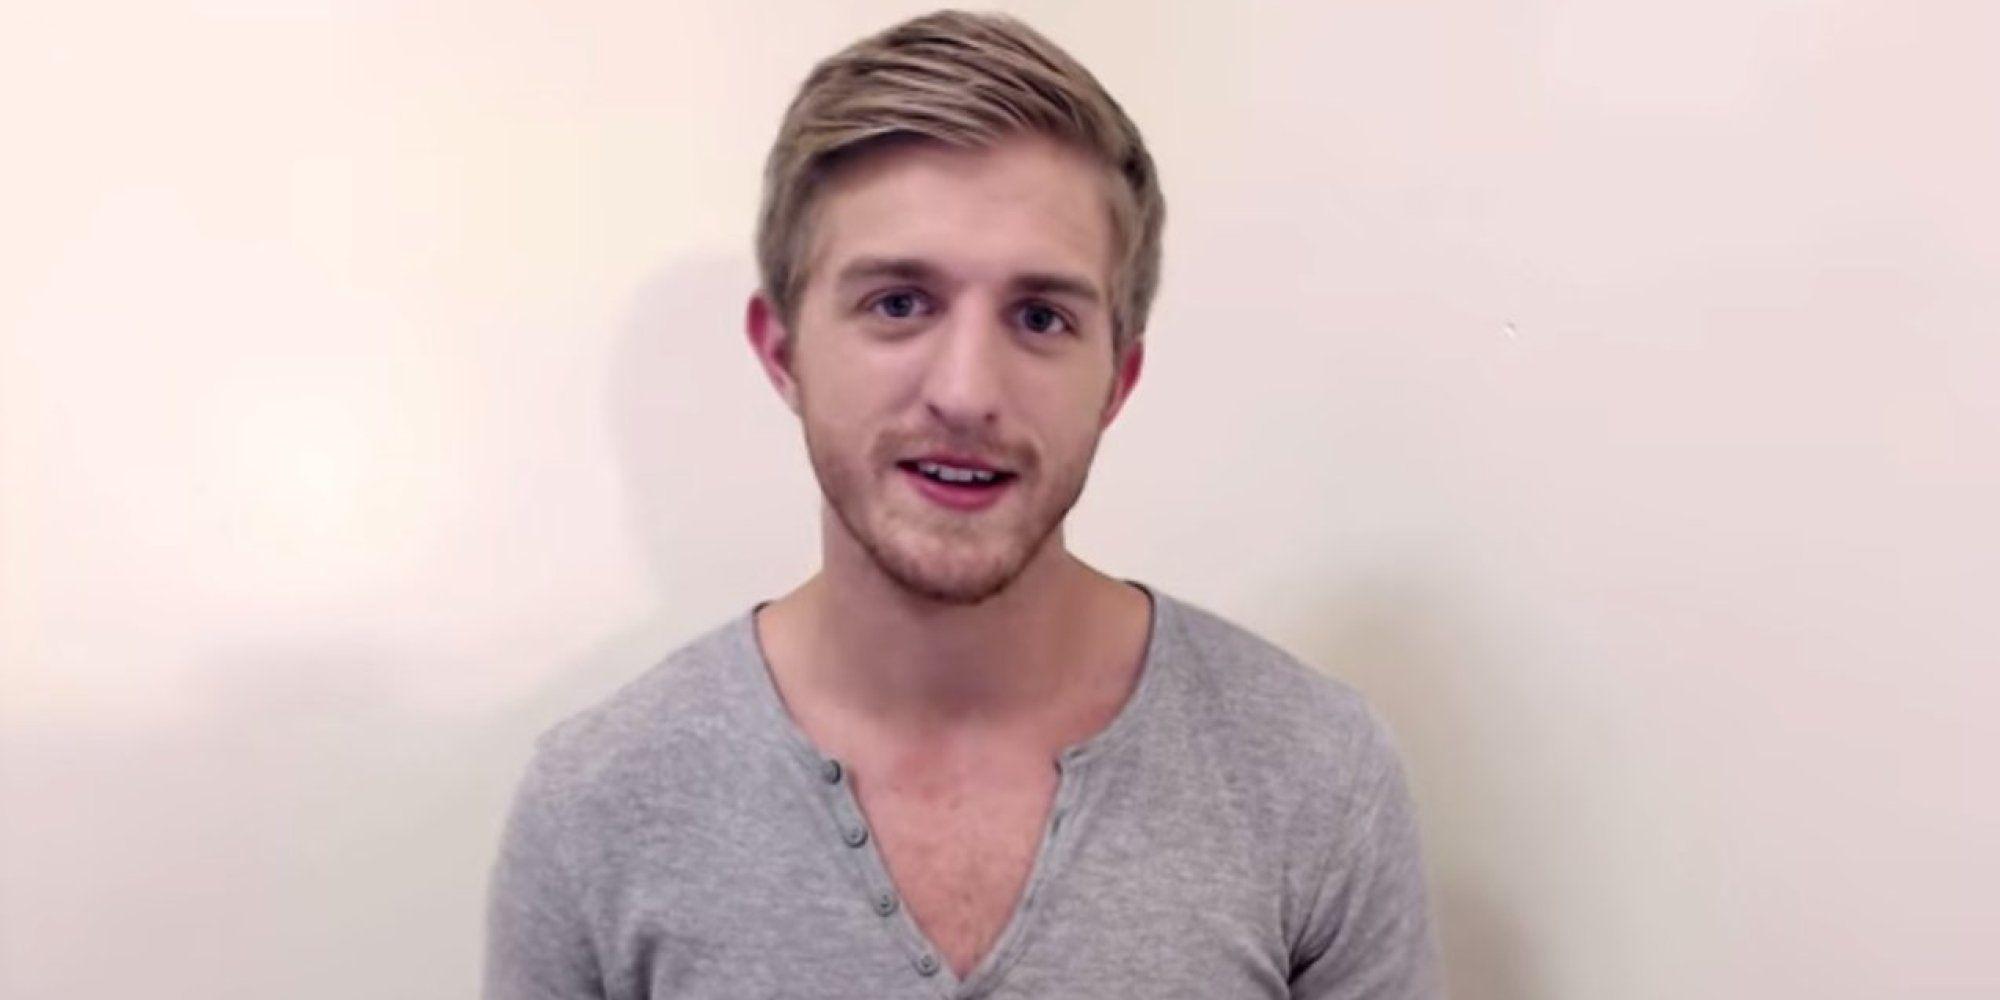 Actor Porno Español Gay De Moda levi michaels (actor adult) | levi, michael